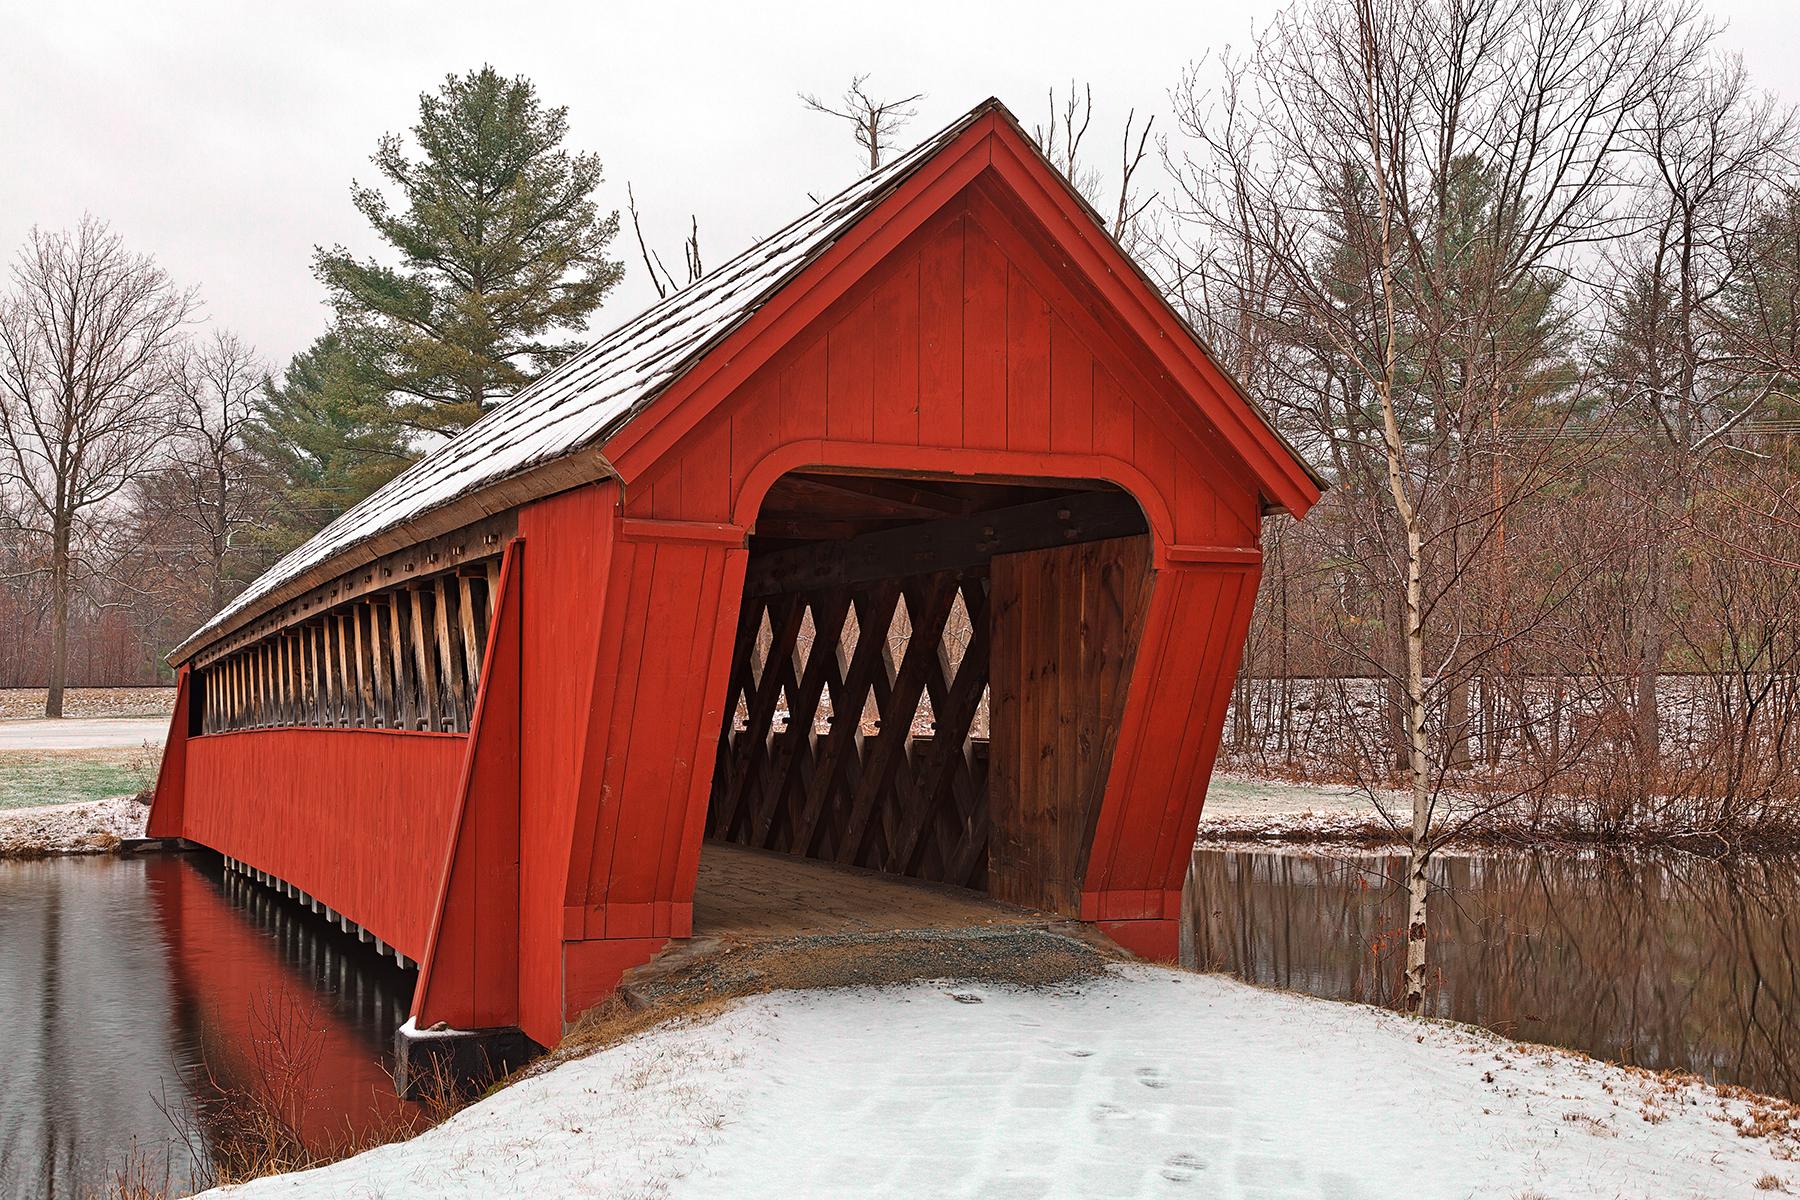 Jack o'lantern snow covered bridge - hdr photo